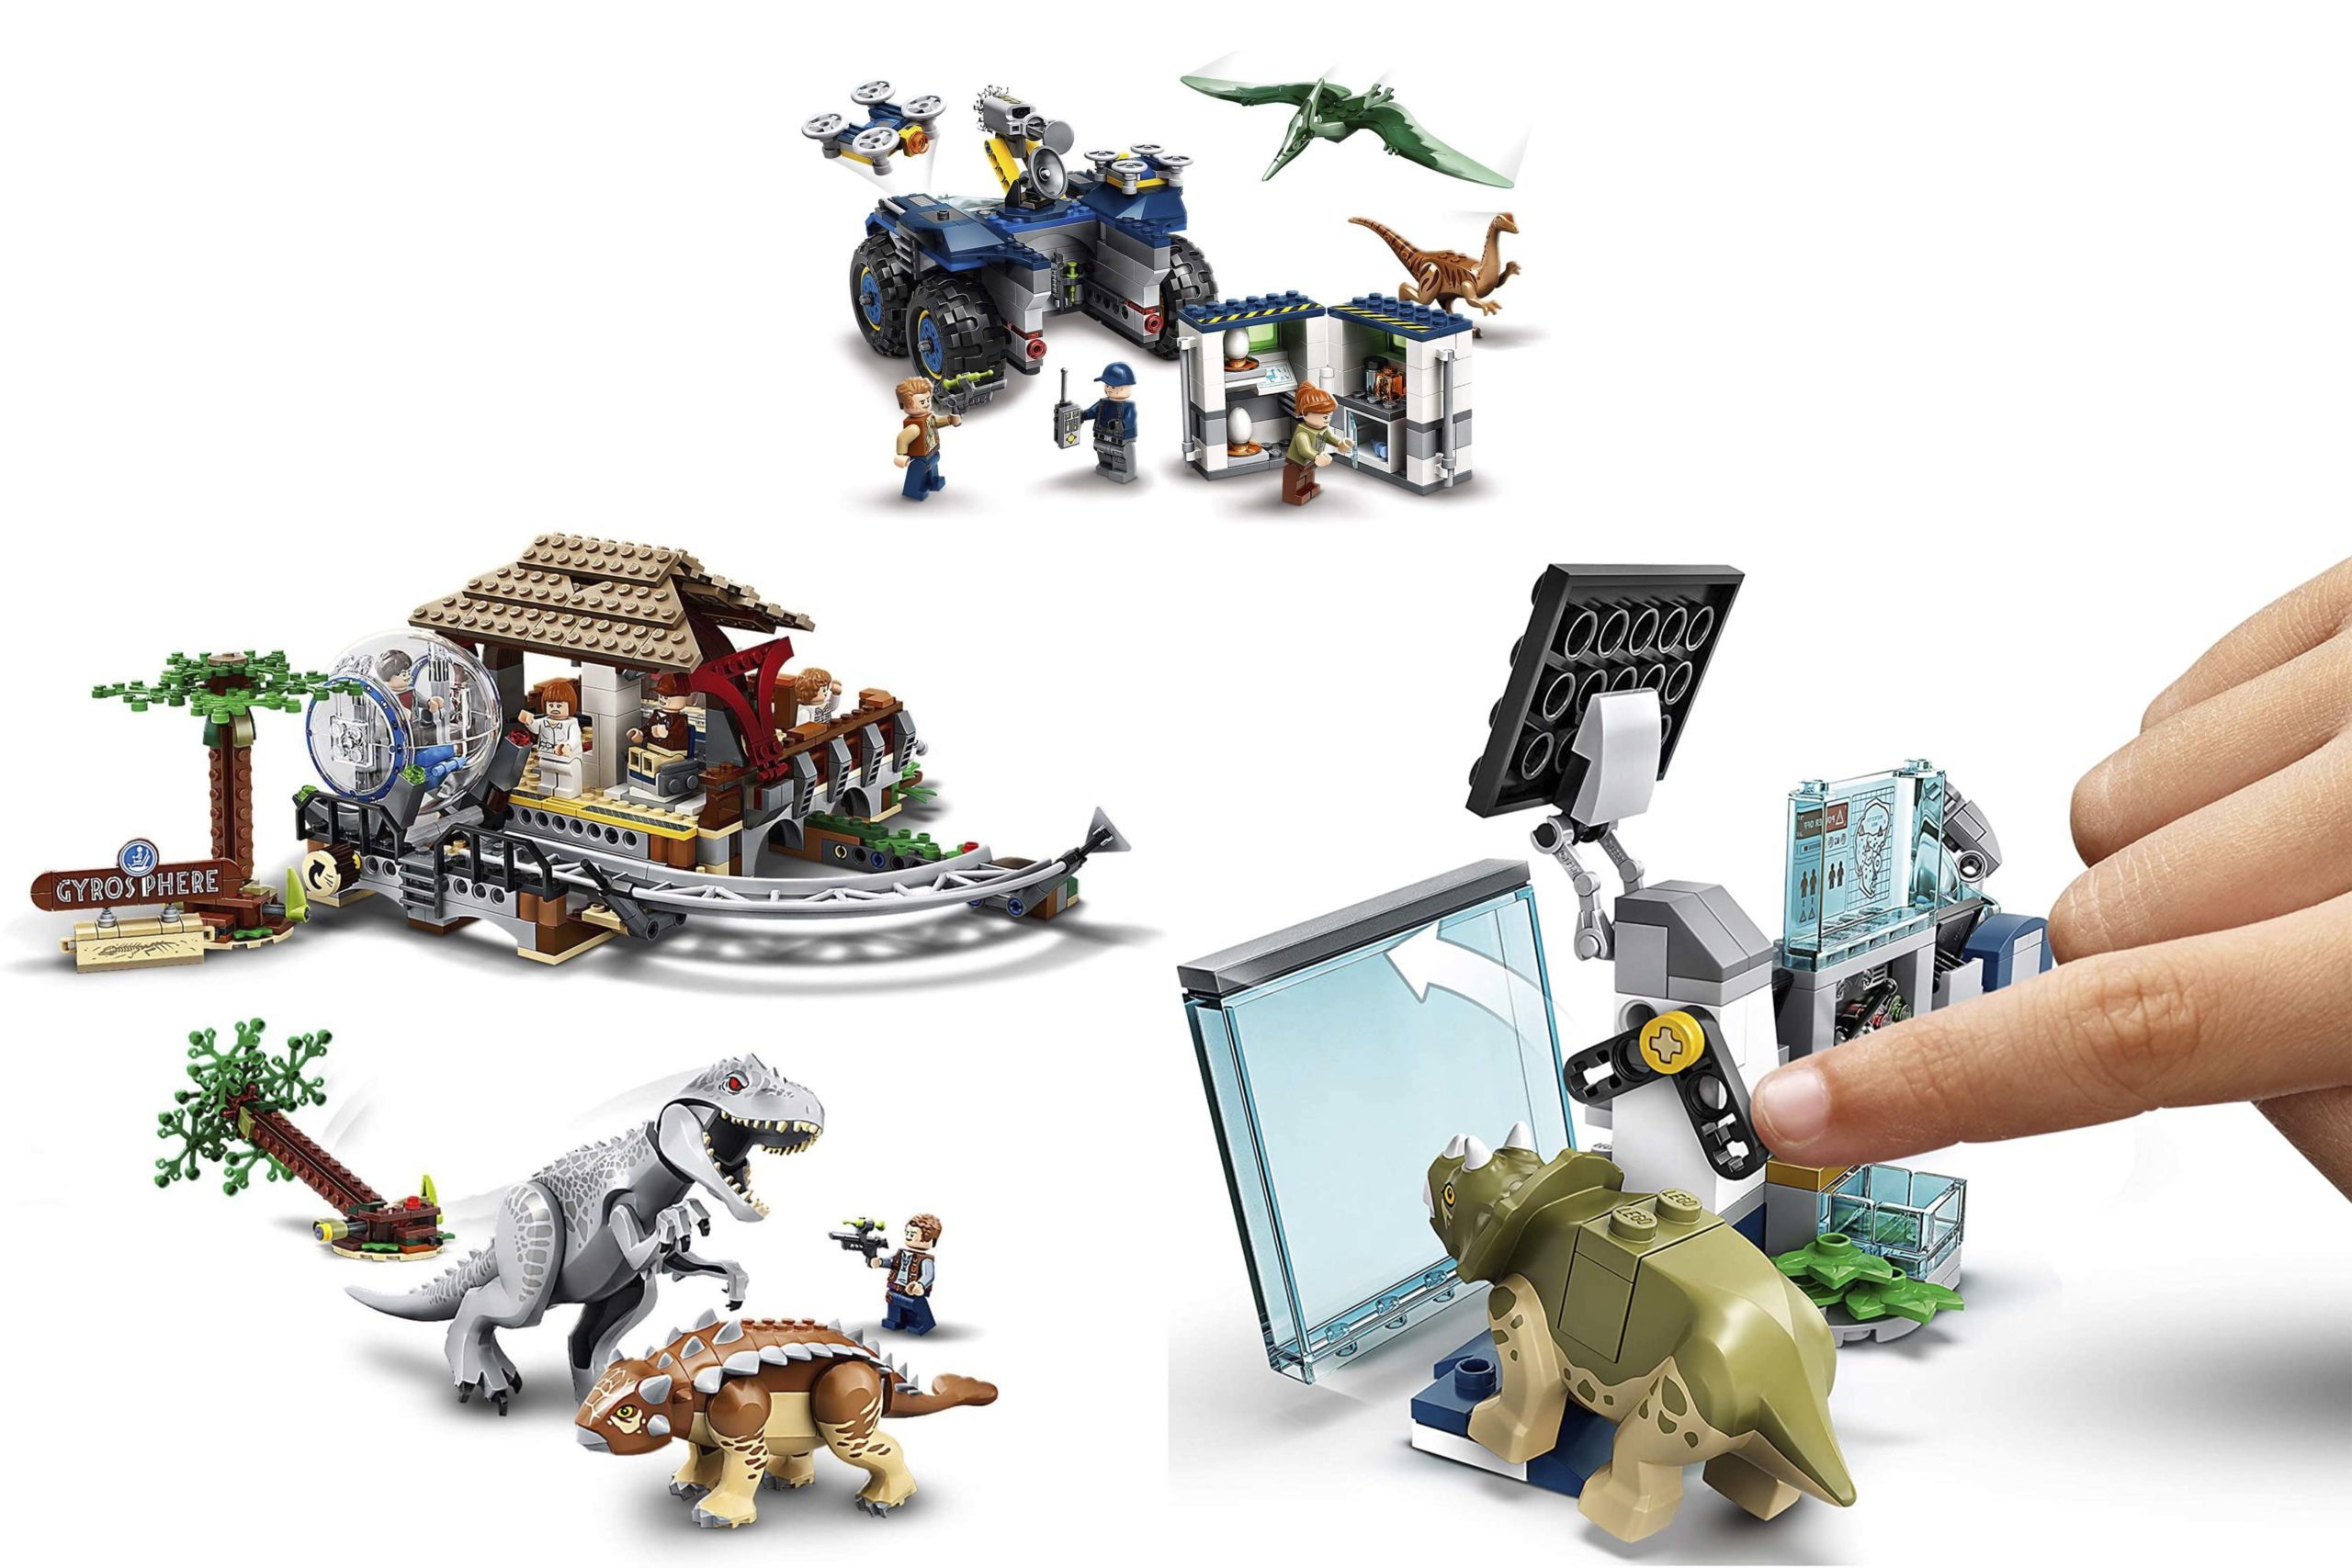 LEGO Jurassic World 2020 sets - Header Image